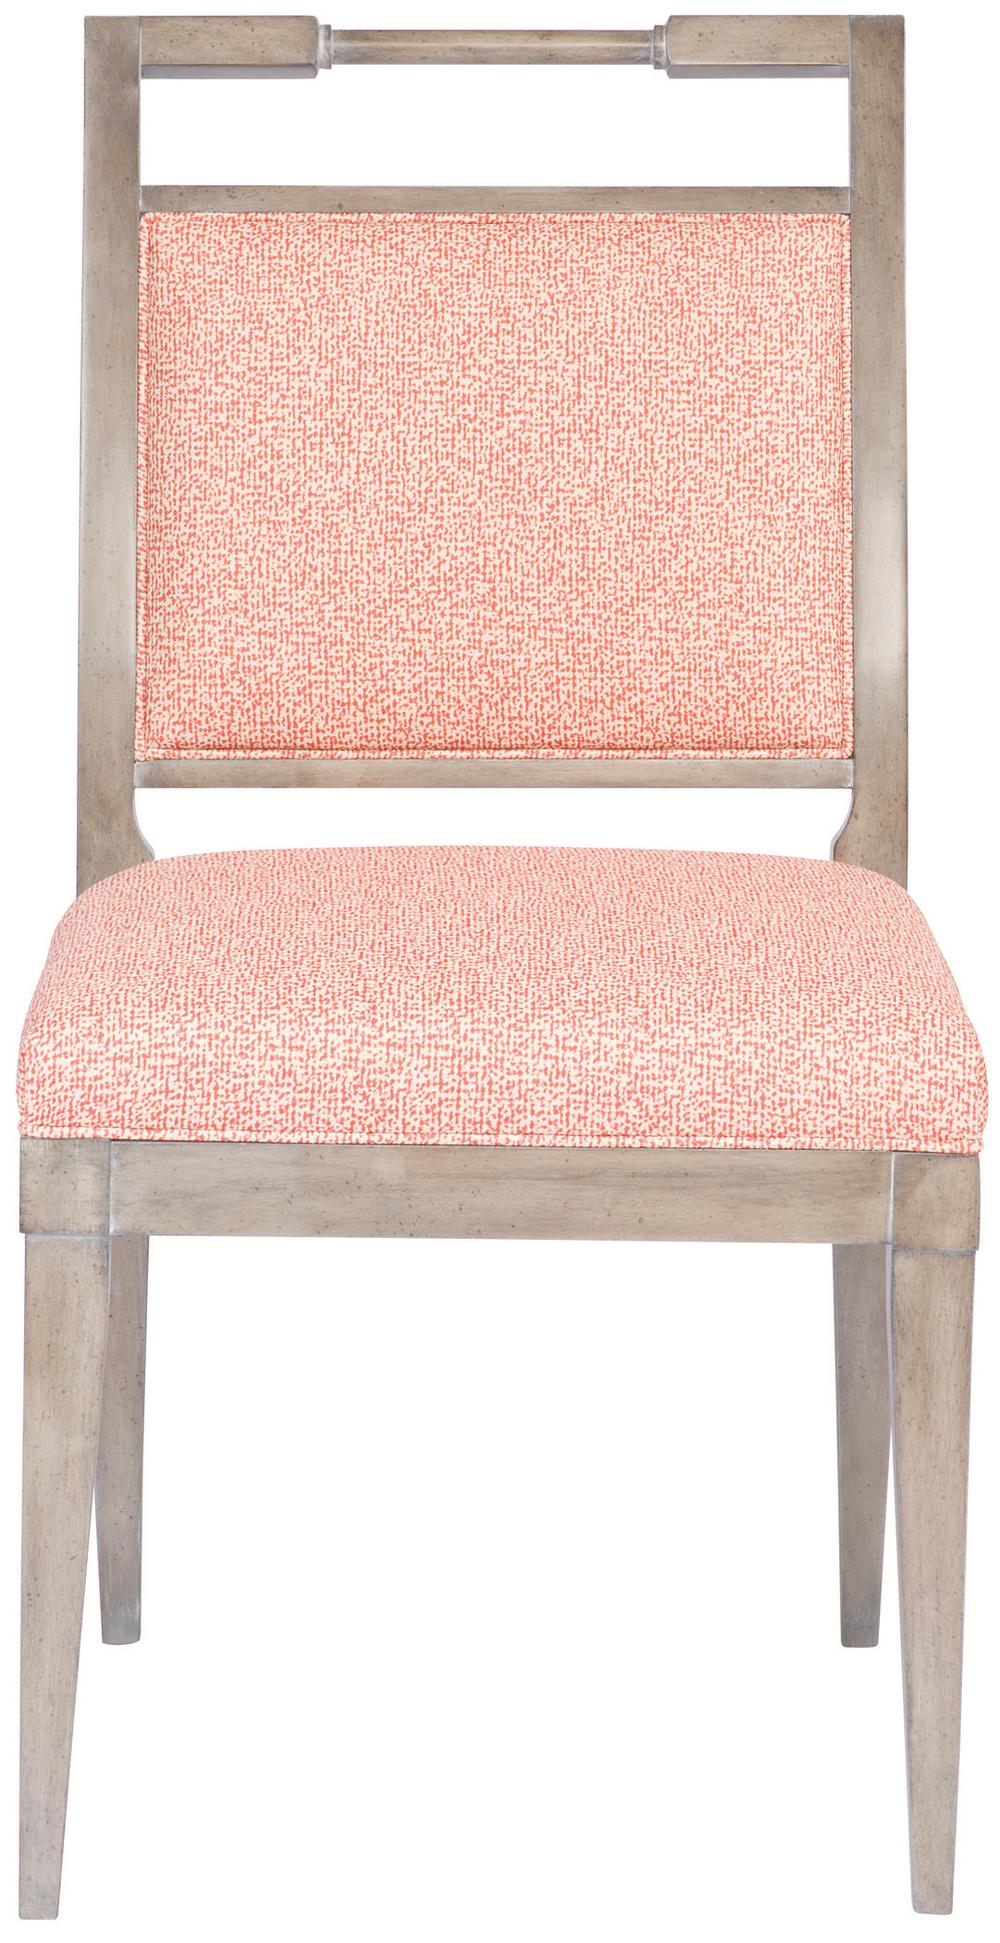 Vanguard Furniture - Maria Dining Side Chair